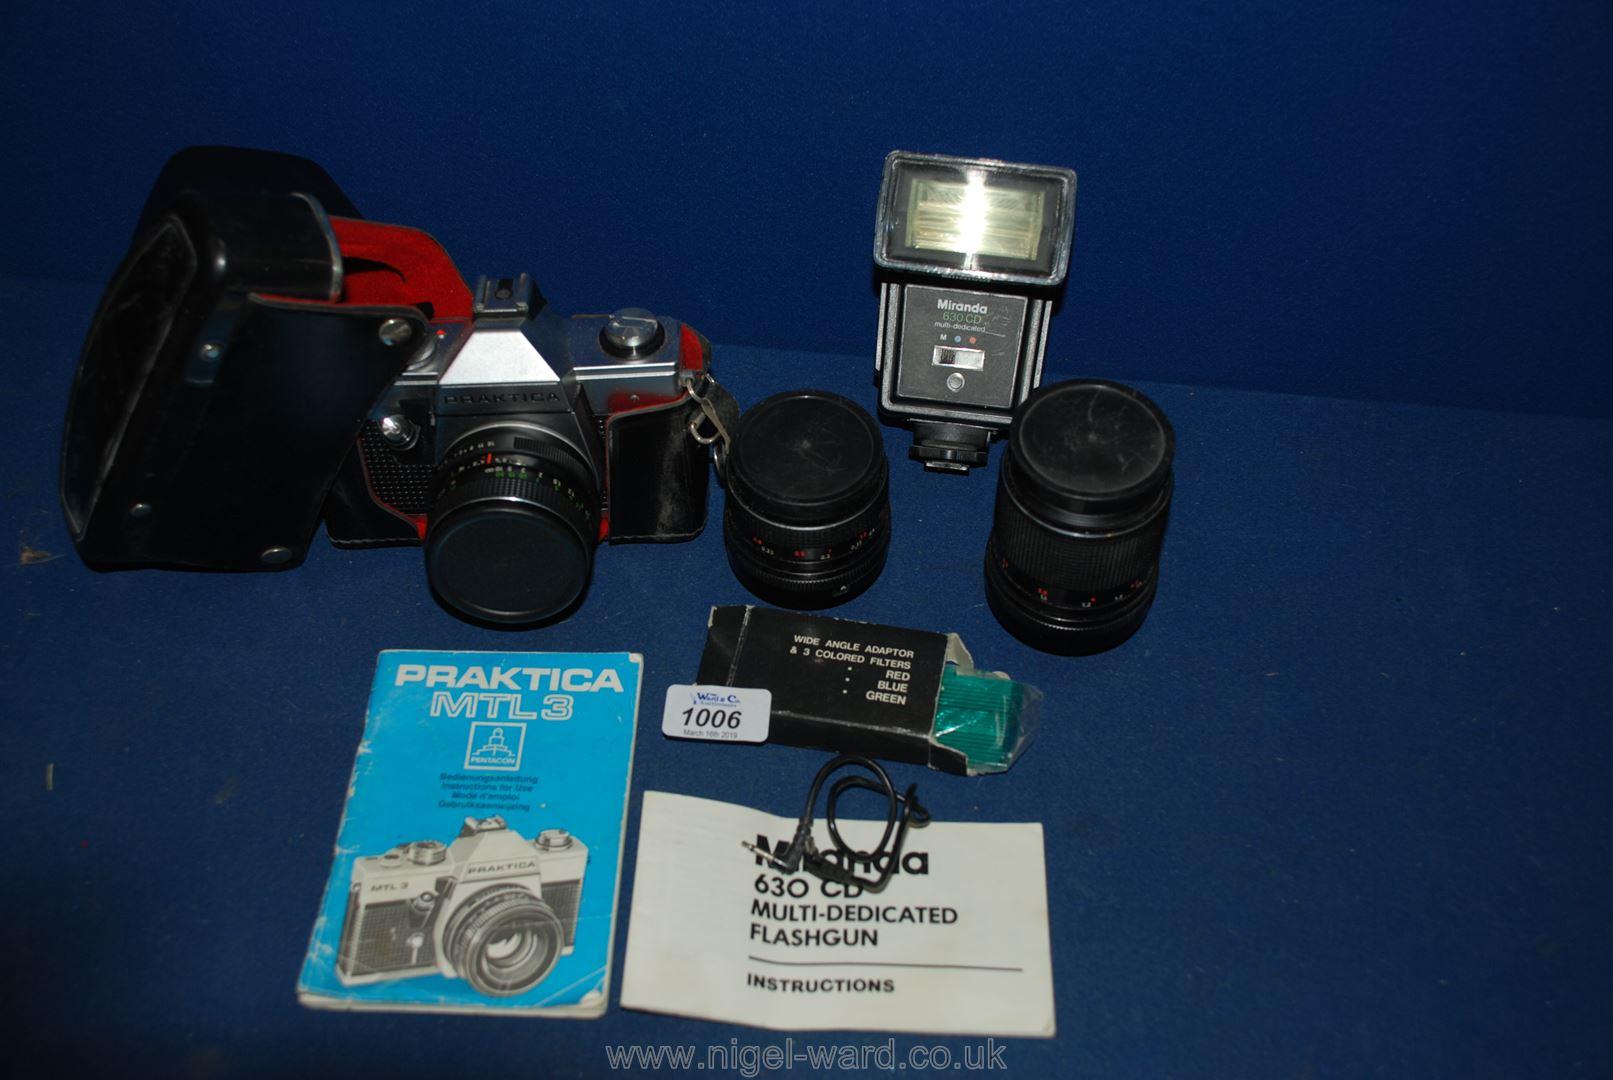 Lot 1006 - A Praktica MTL3 SLR Camera with 50mm lense, Eveready case, Carl Zeiss Jena 35mm 52.